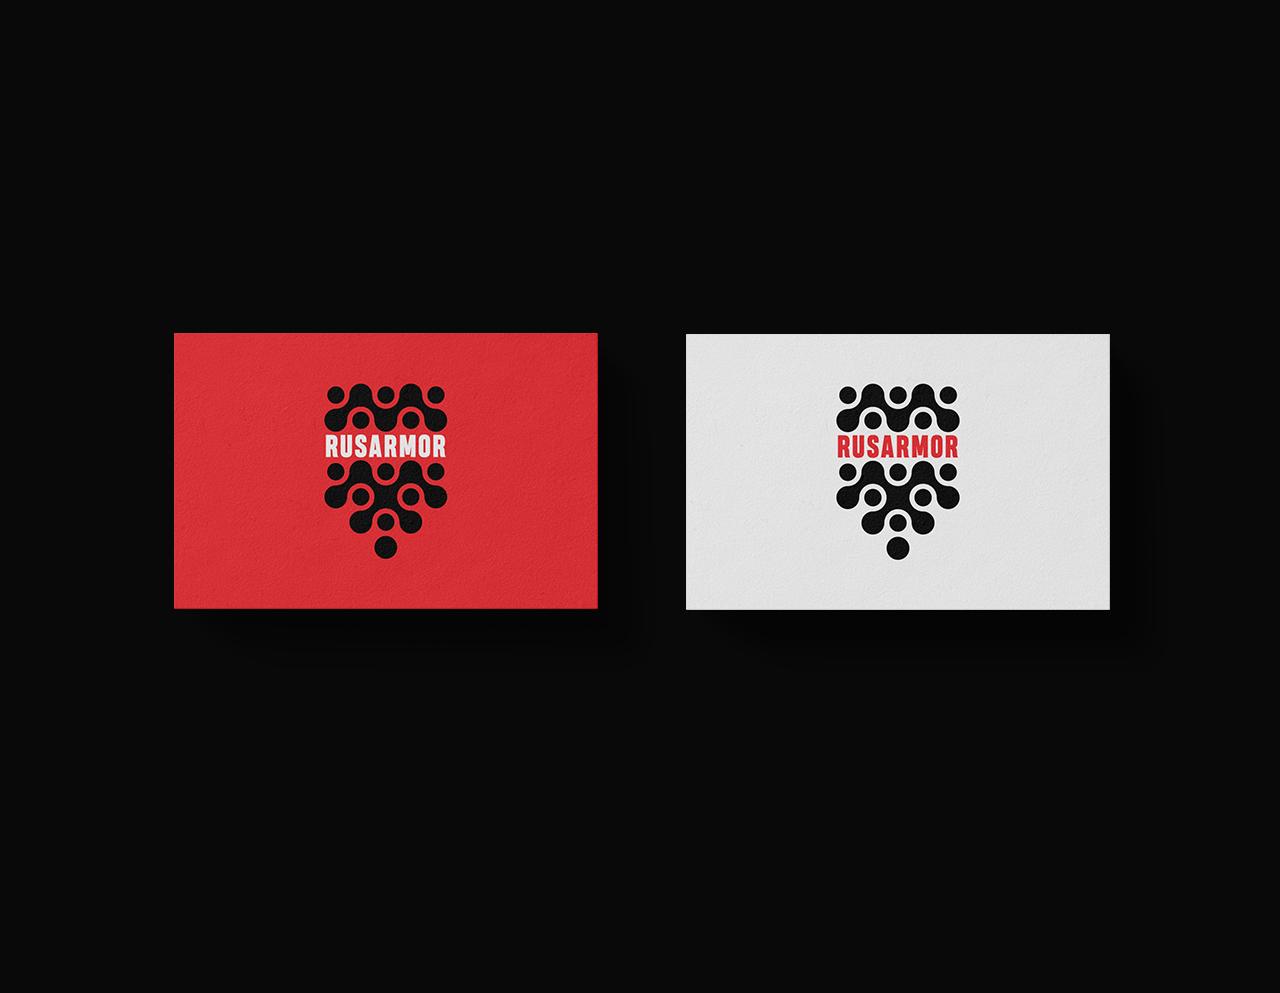 Разработка логотипа технологического стартапа РУСАРМОР фото f_0725a0cebed0ab3a.jpg